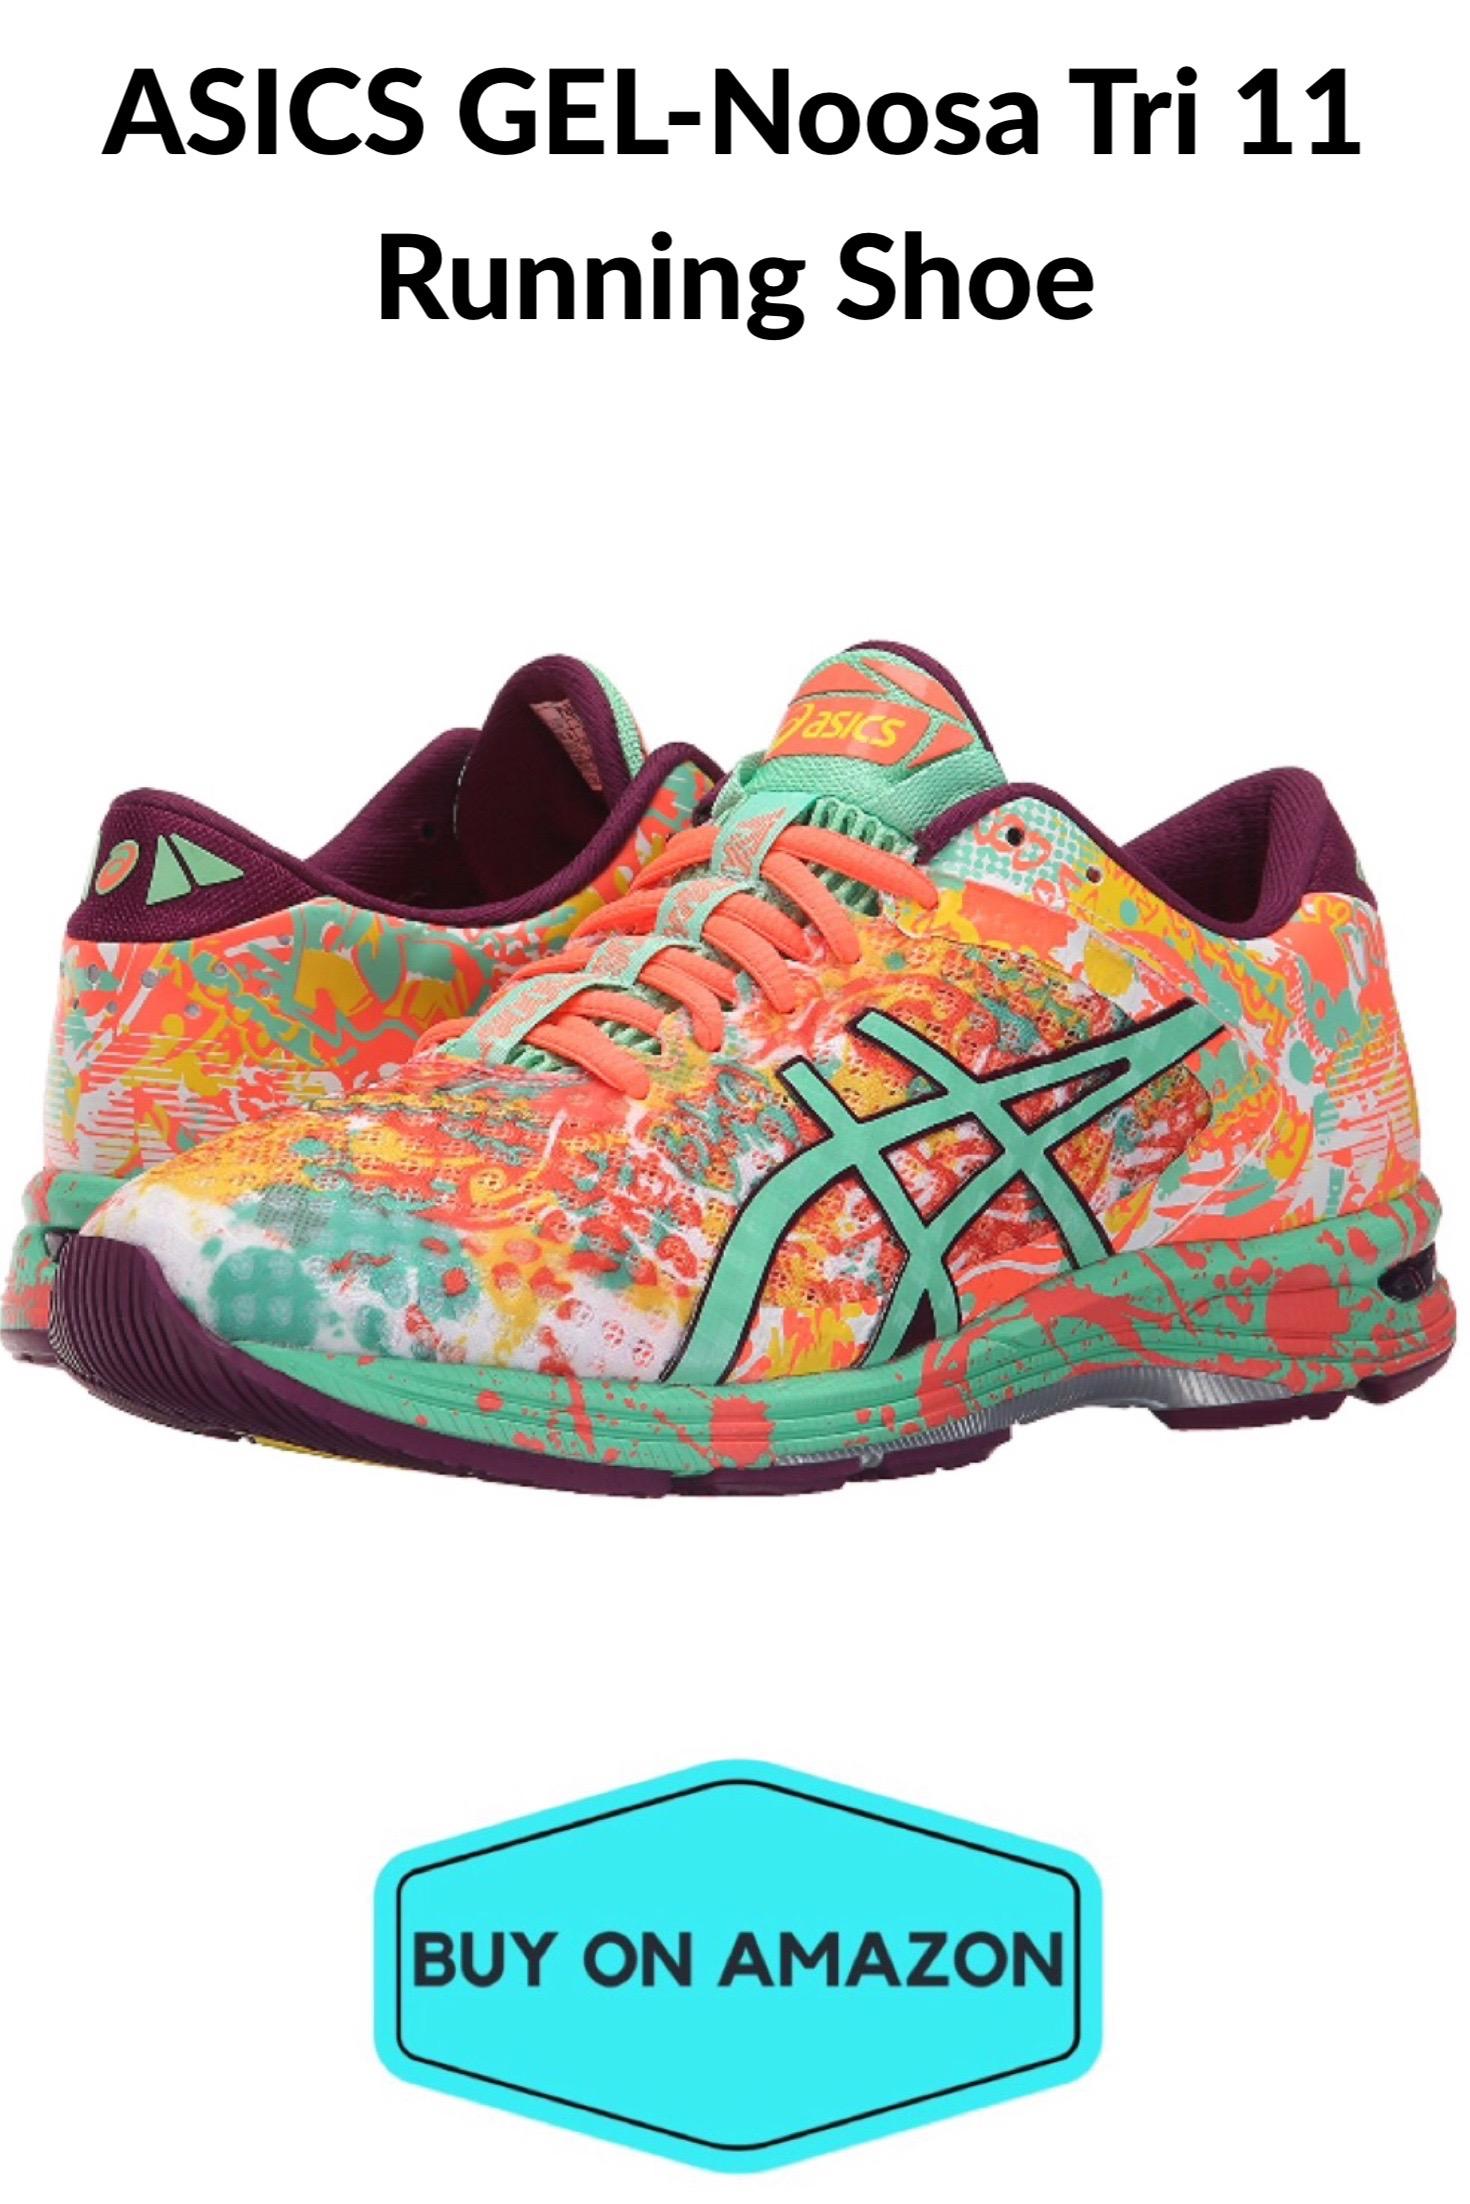 ASICS GEL-Noosa Tri 11 Women's Running Shoe